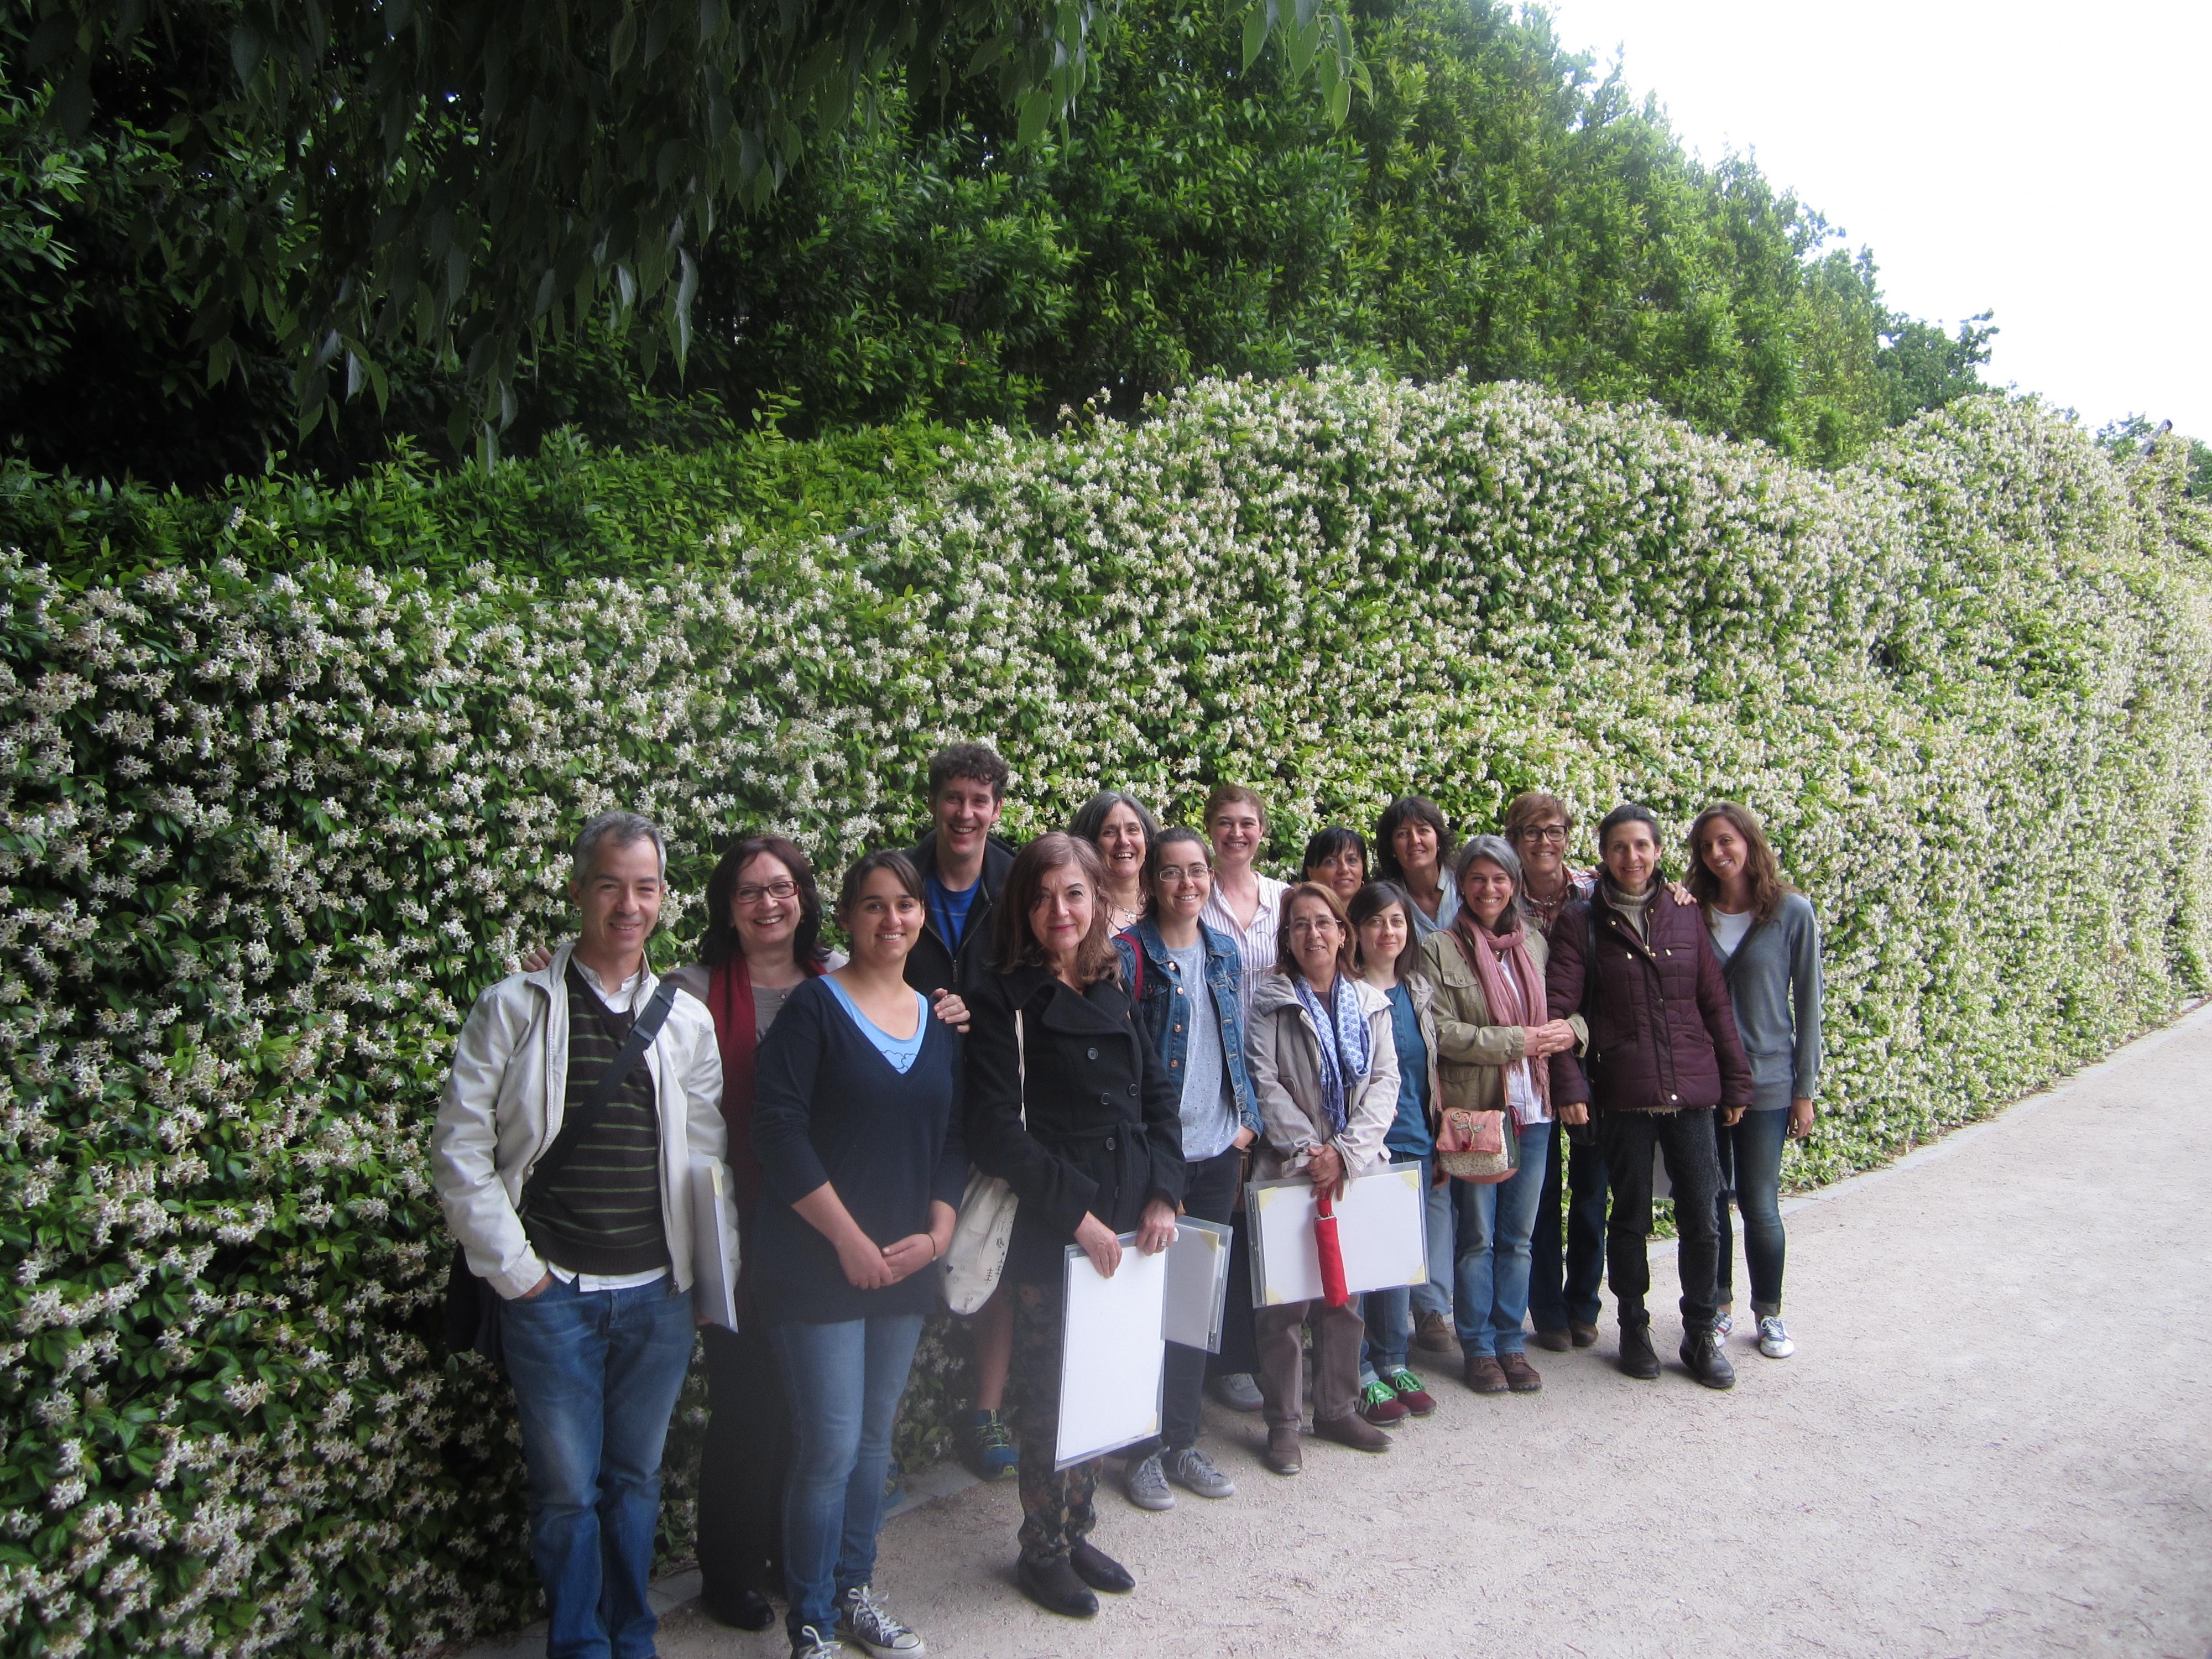 Alumnos del 6º Curso de dibujo botánico en el RJBM